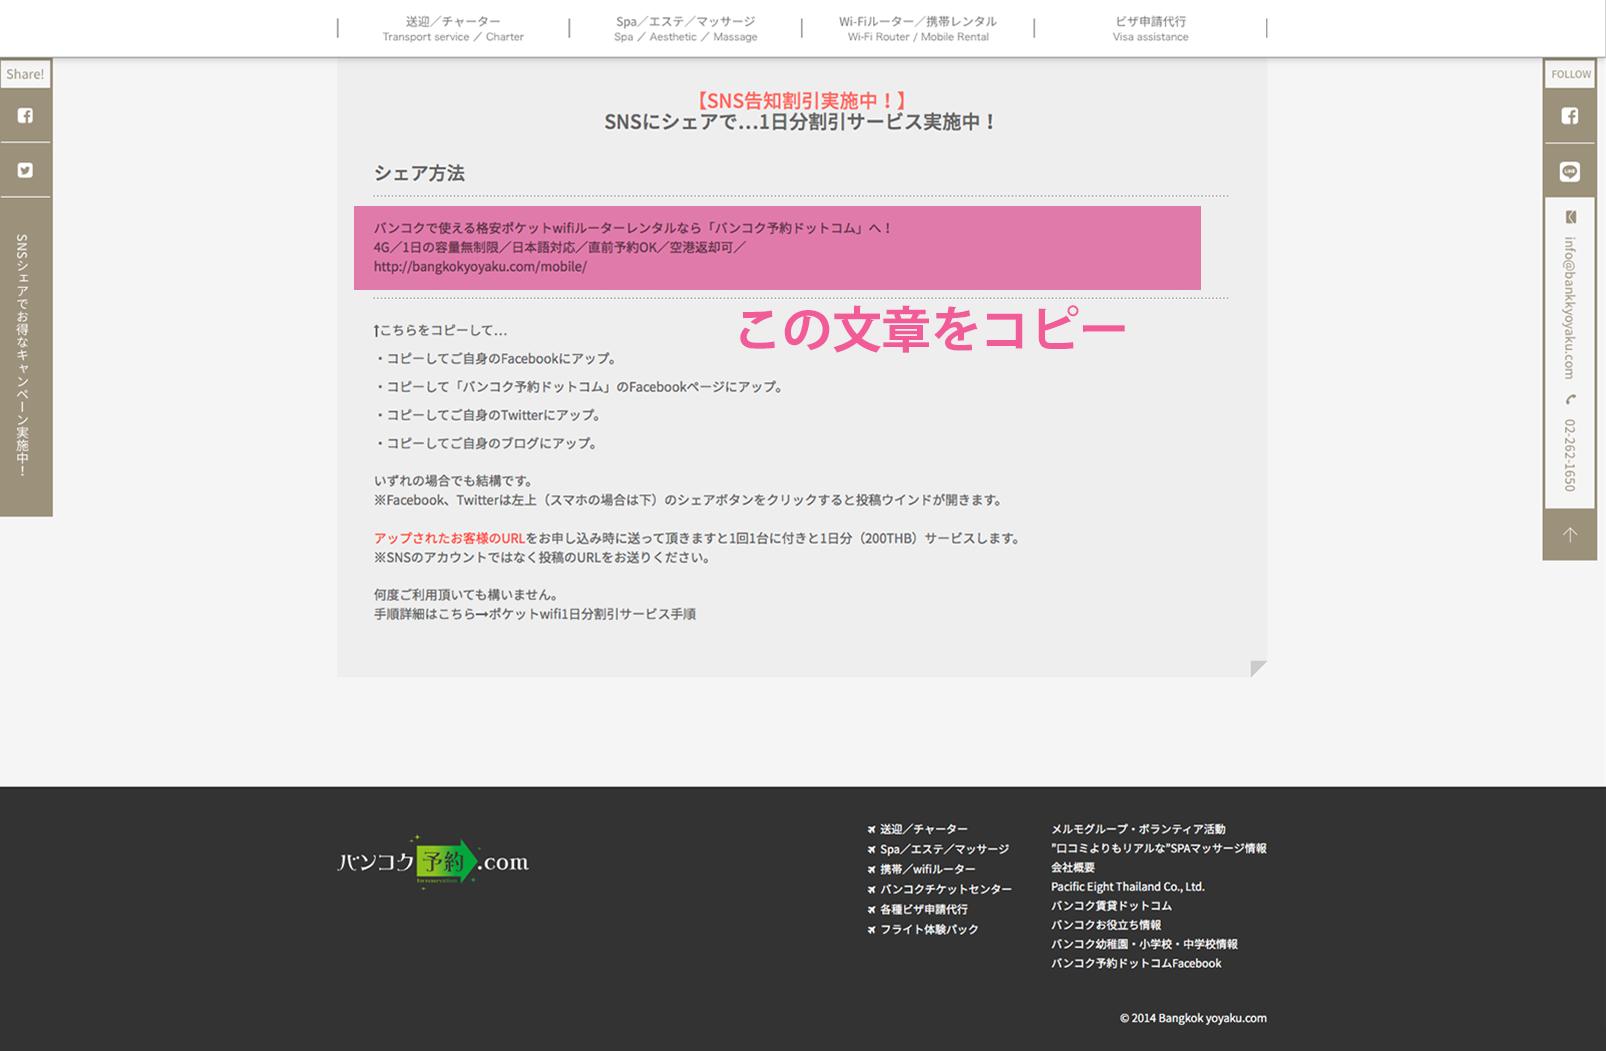 share_step1